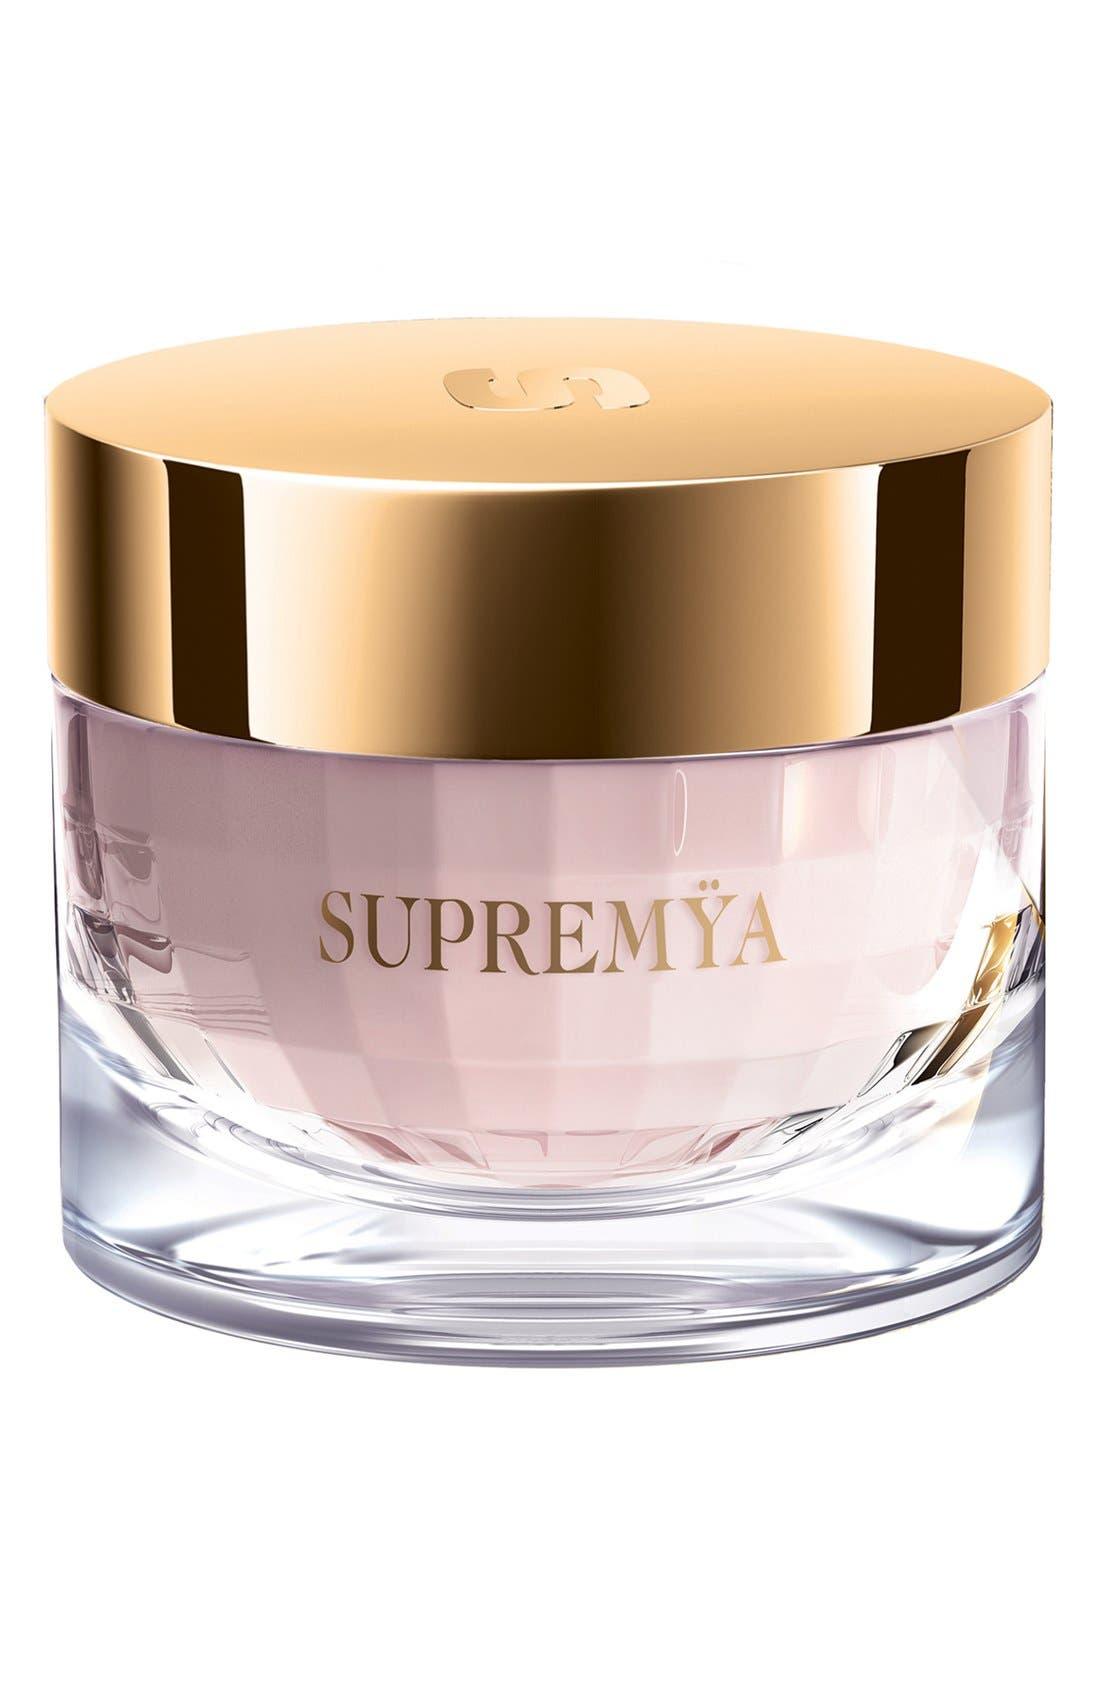 Sisley Paris 'Supremÿa' Cream at Night